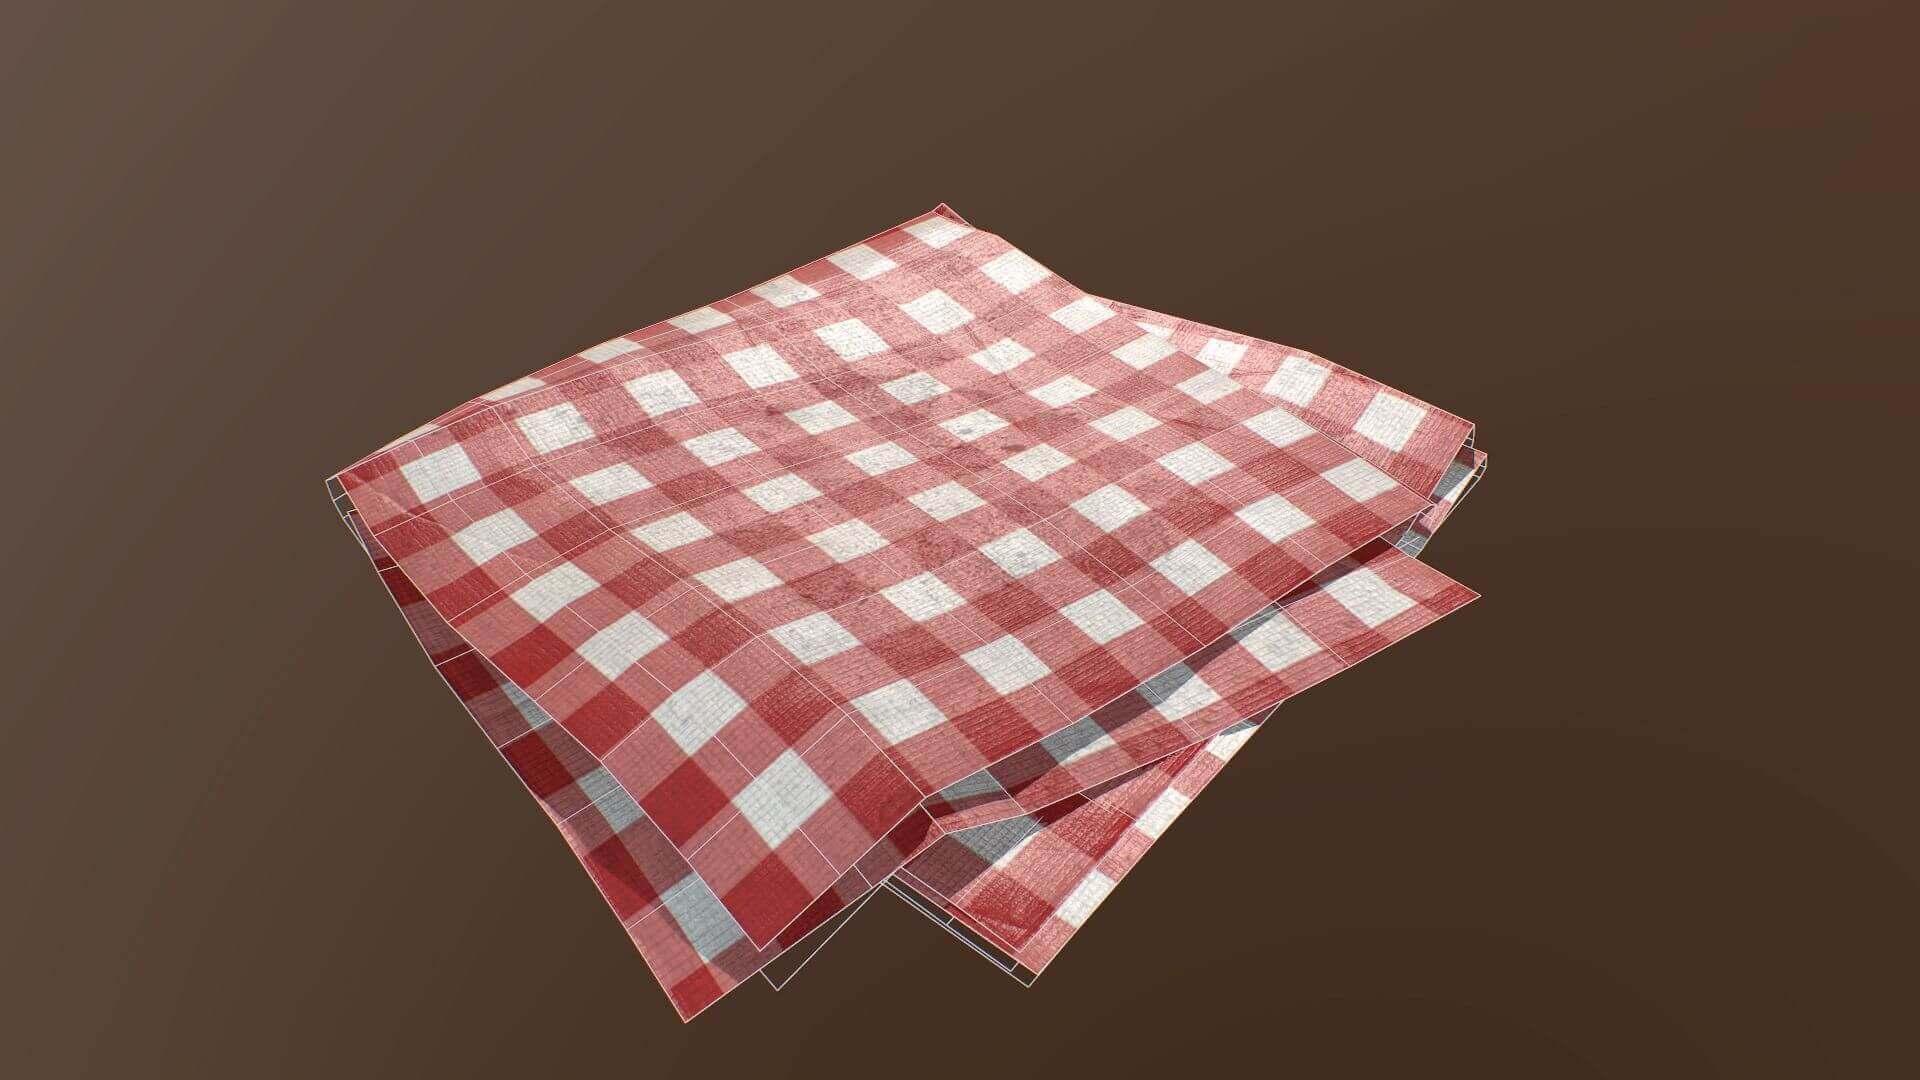 Folded Table Cloth 3d Model